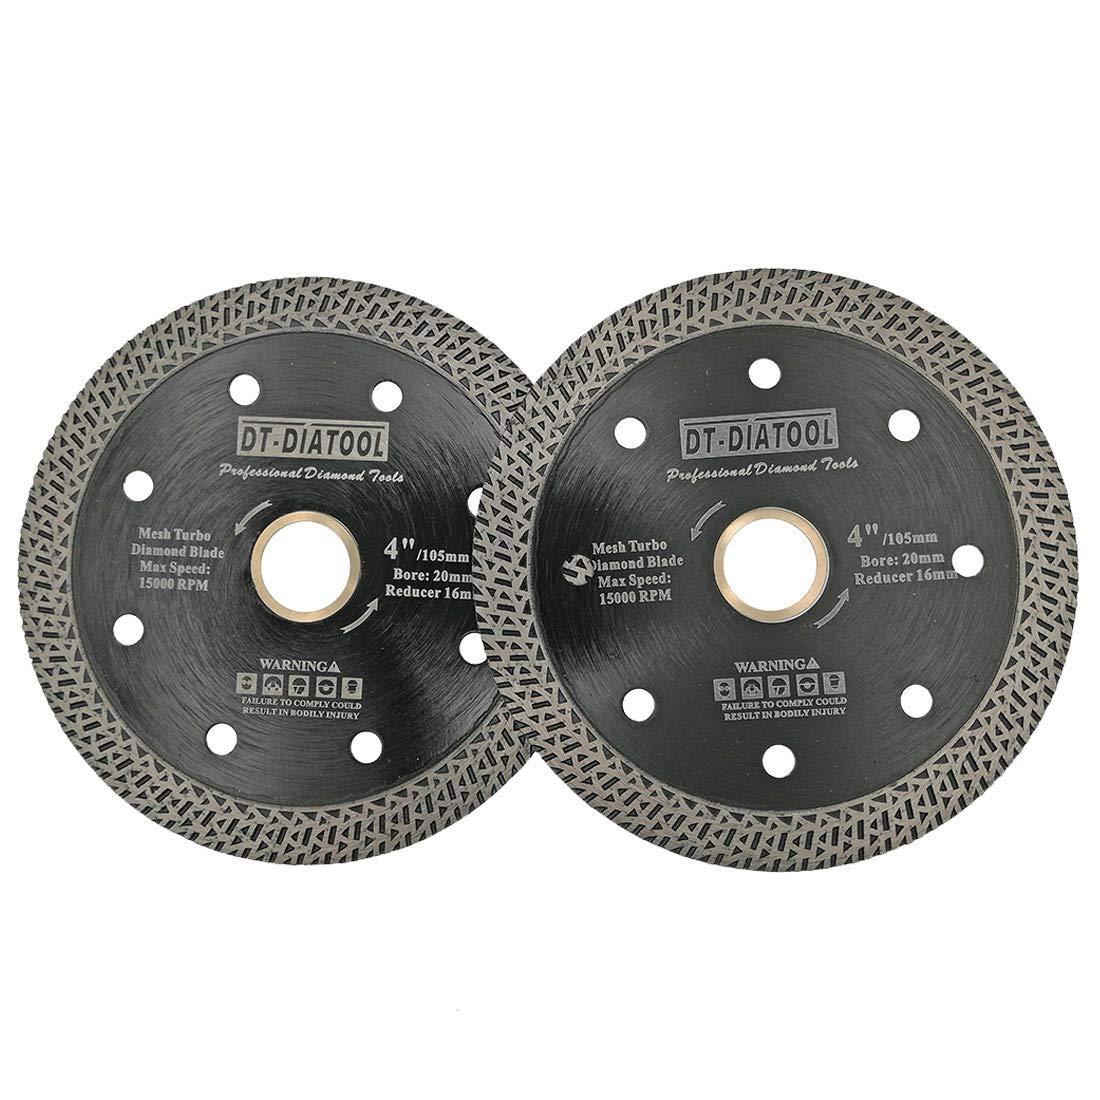 DT-DIATOOL Mesh Turbo Diamond Blade Hot Pressed Sintered Granite Marble Tile Ceramic Brick Diamond Cutting Disc Diameter 4 Inch Pack of 2